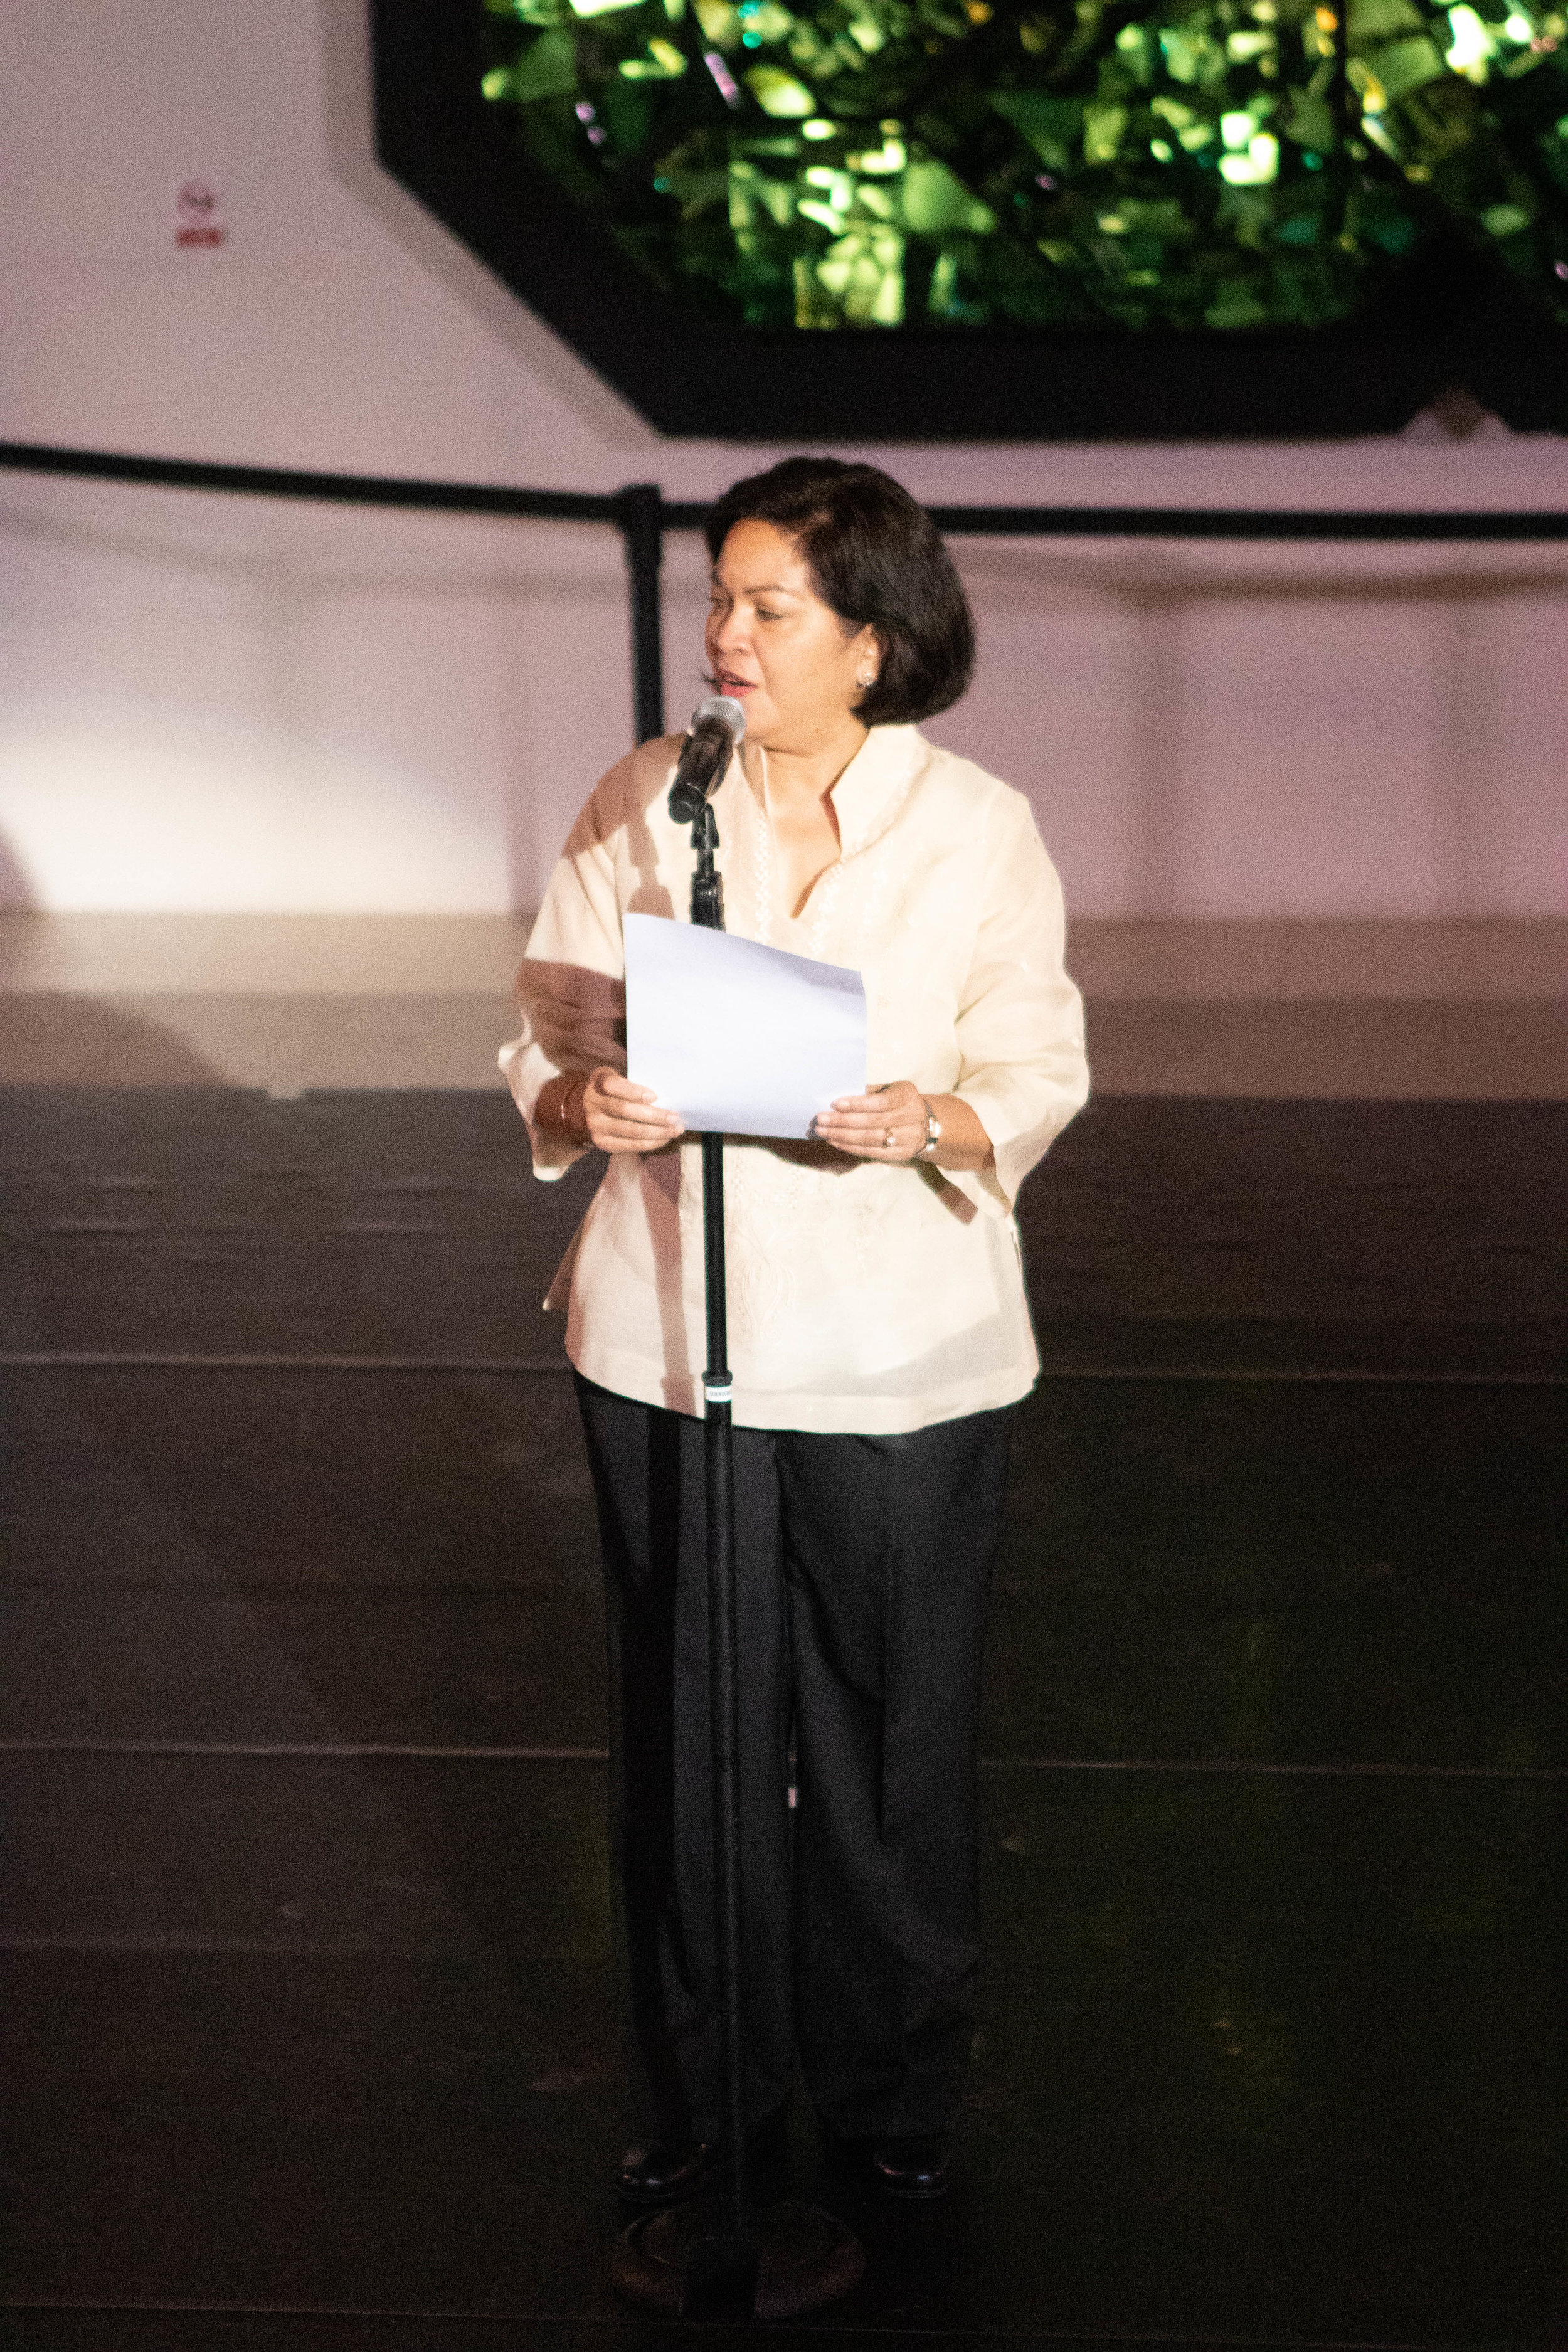 Dr. Ana P. Labrador, National Museum assistant director